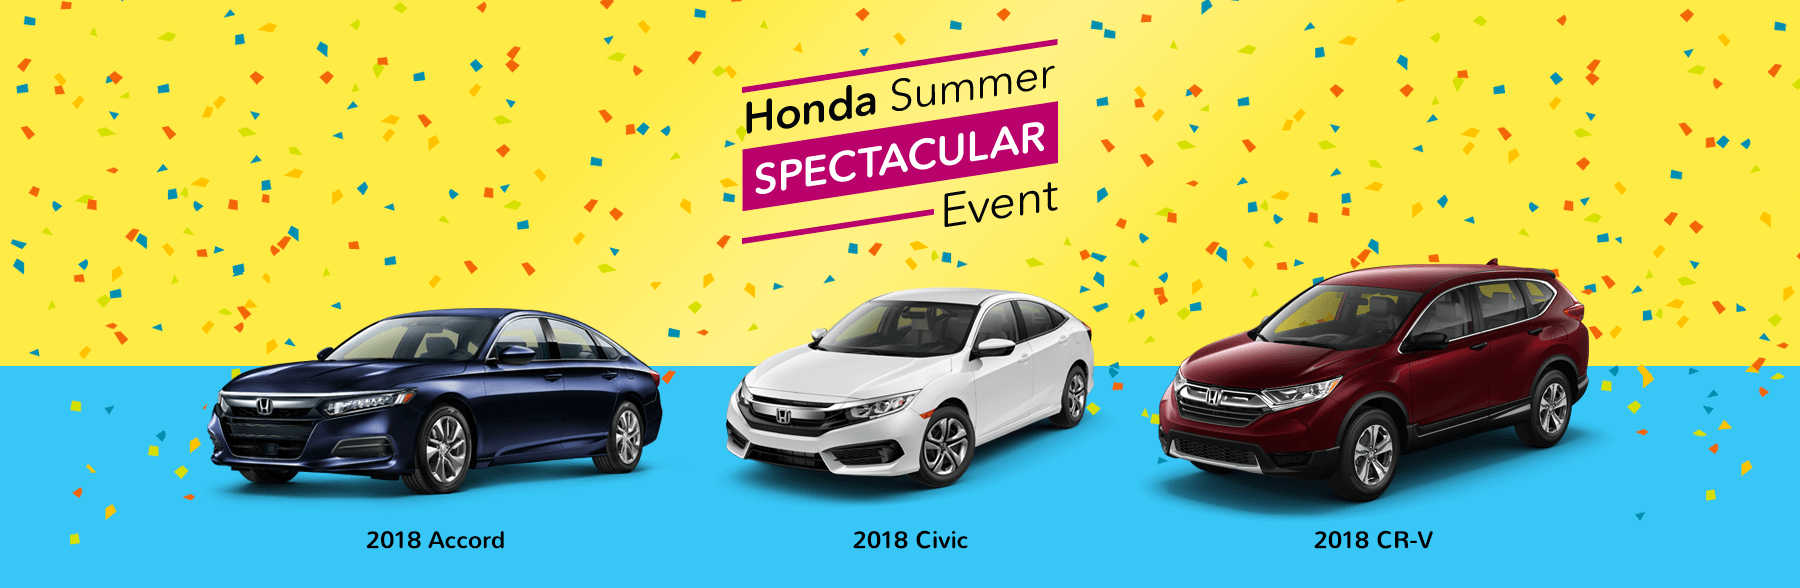 2018 Honda Summer Spectacular Event Slider